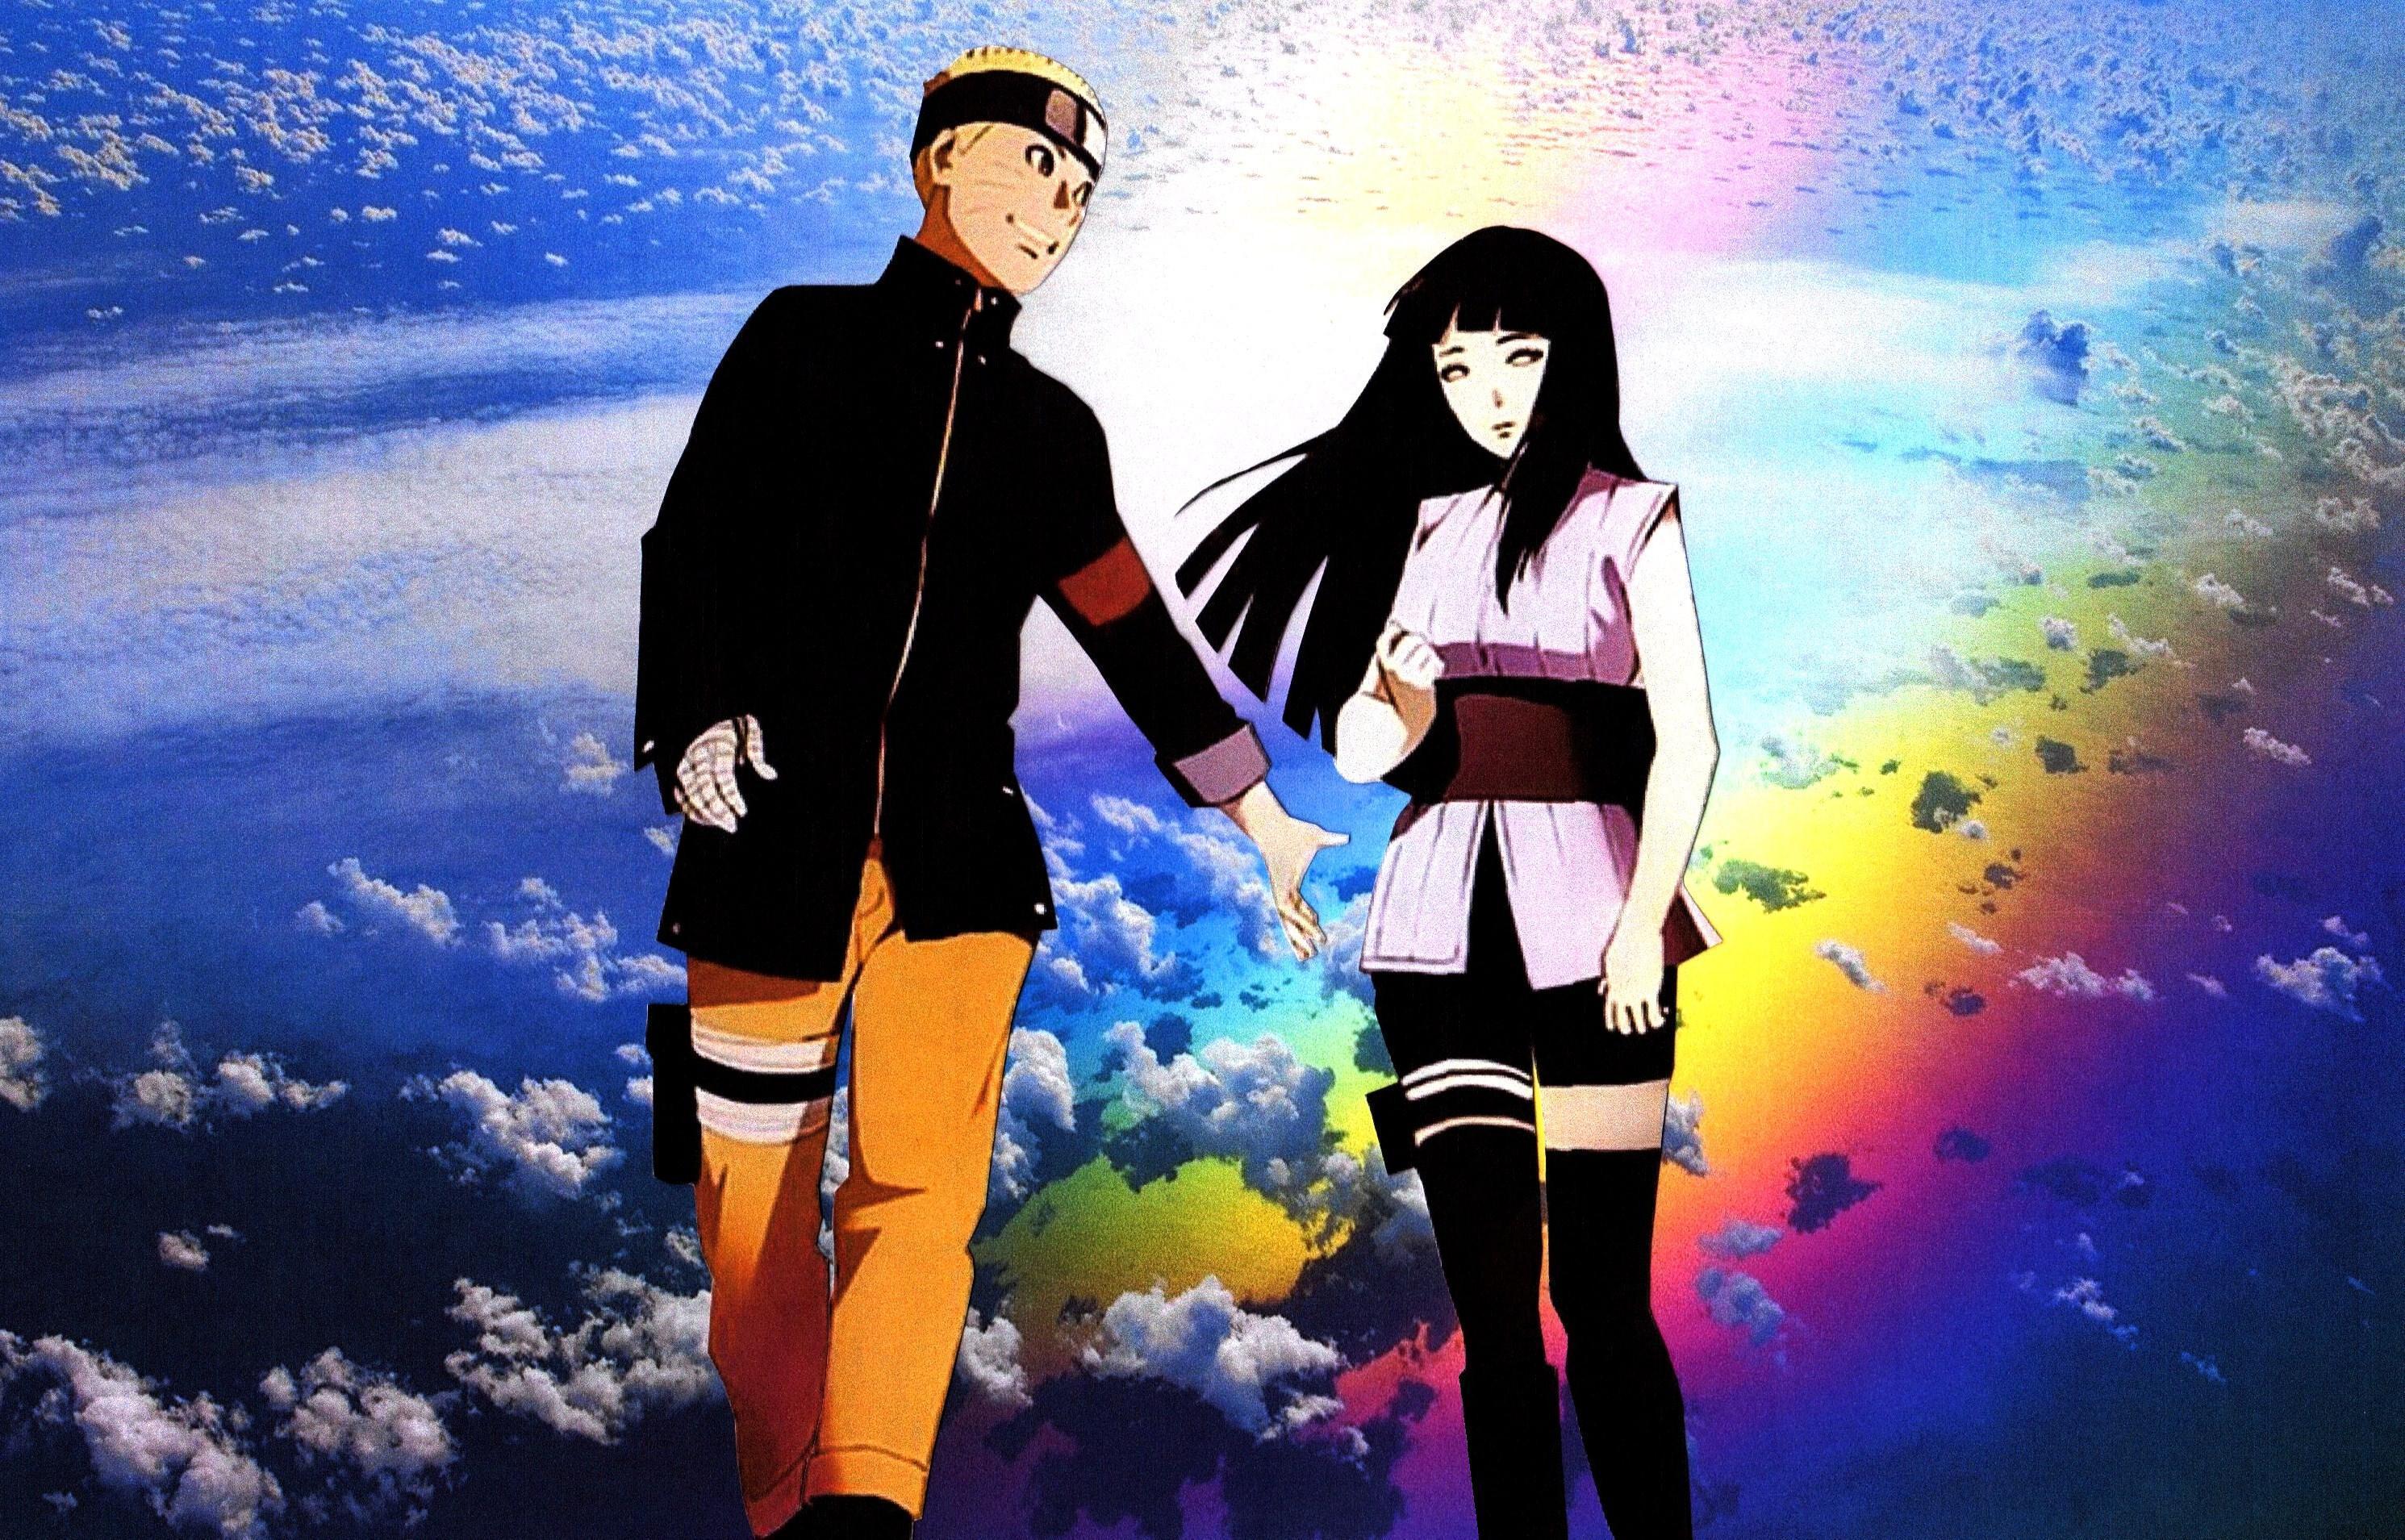 Wallpaper Naruto Dan Hinata Hd HD Wallpaper